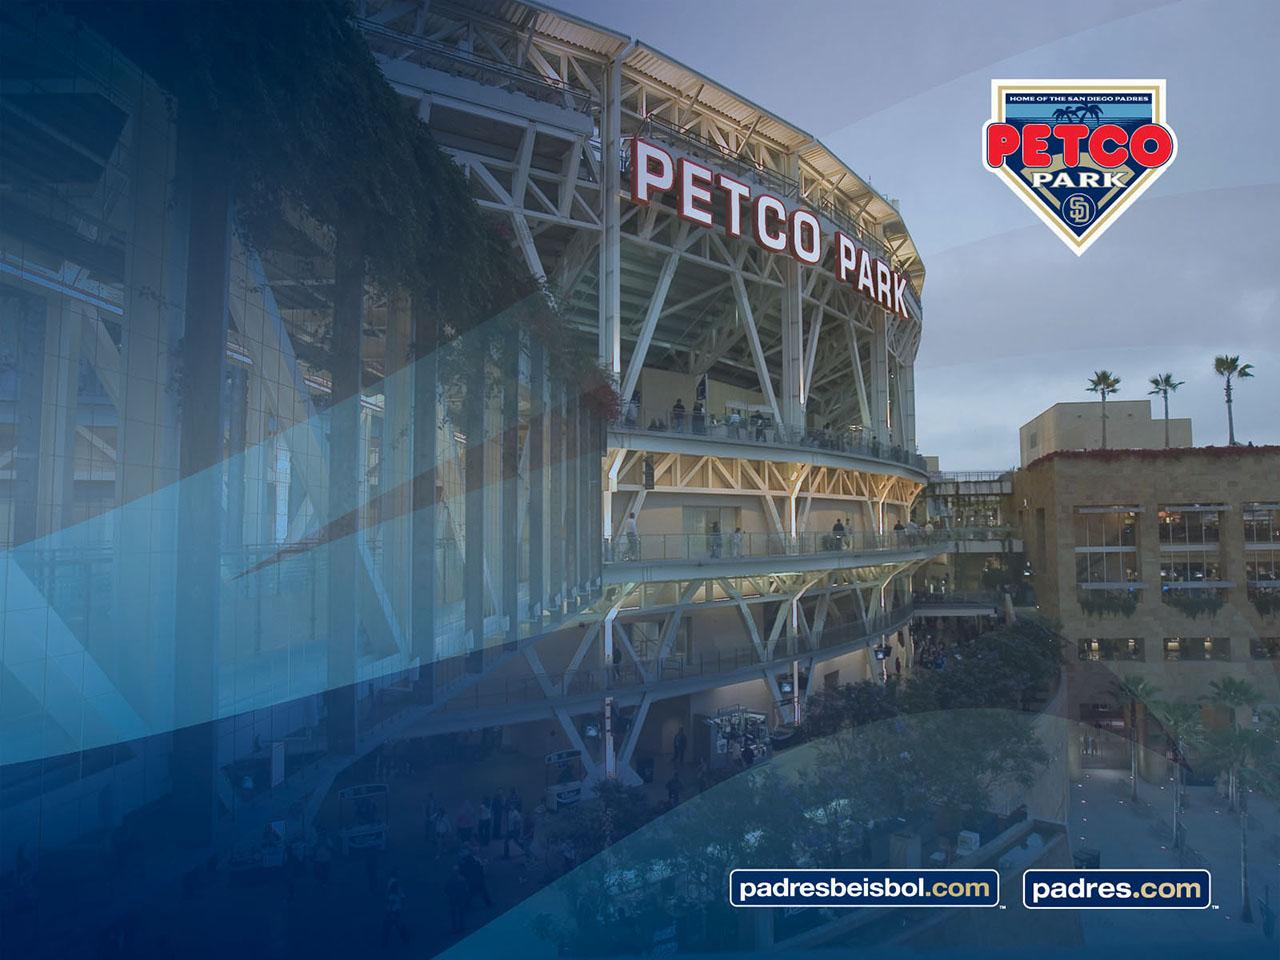 Download San Diego Padres wallpaper San Diego Padres Petco Park 1280x960